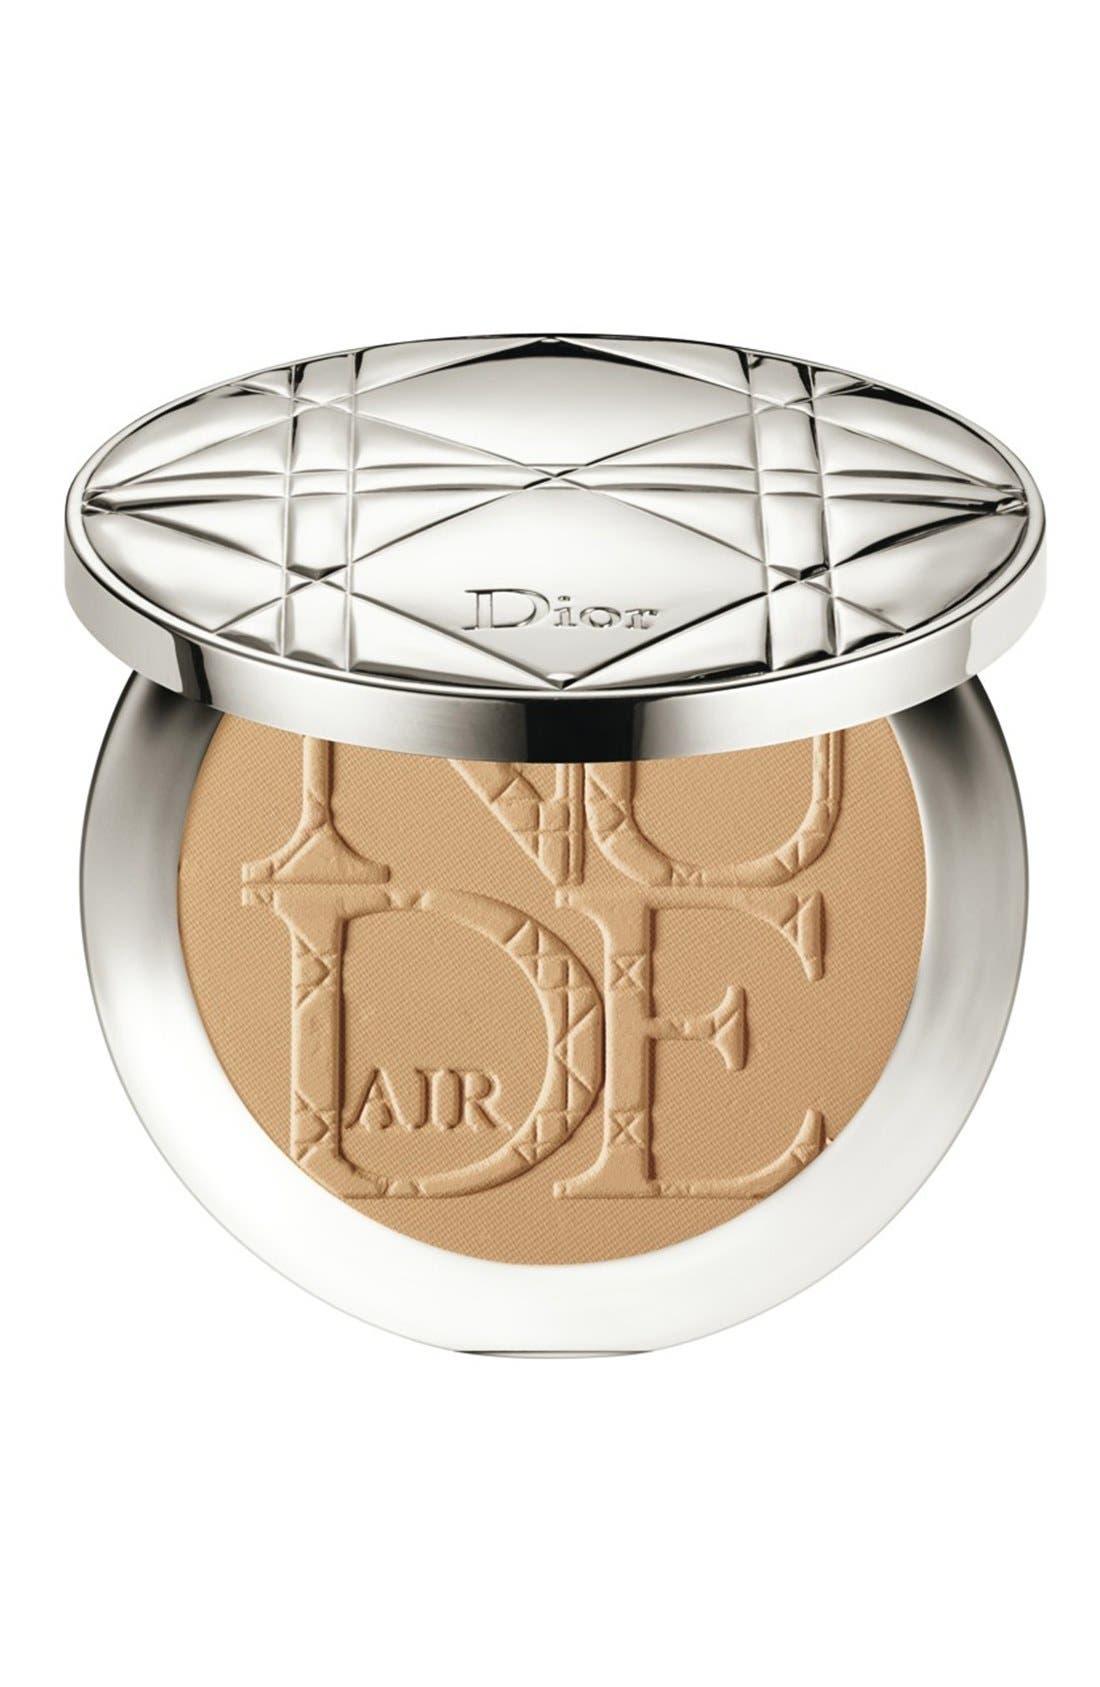 Dior Diorskin Nude Air Healthy Glow Invisible Powder - 040 Honey Beige